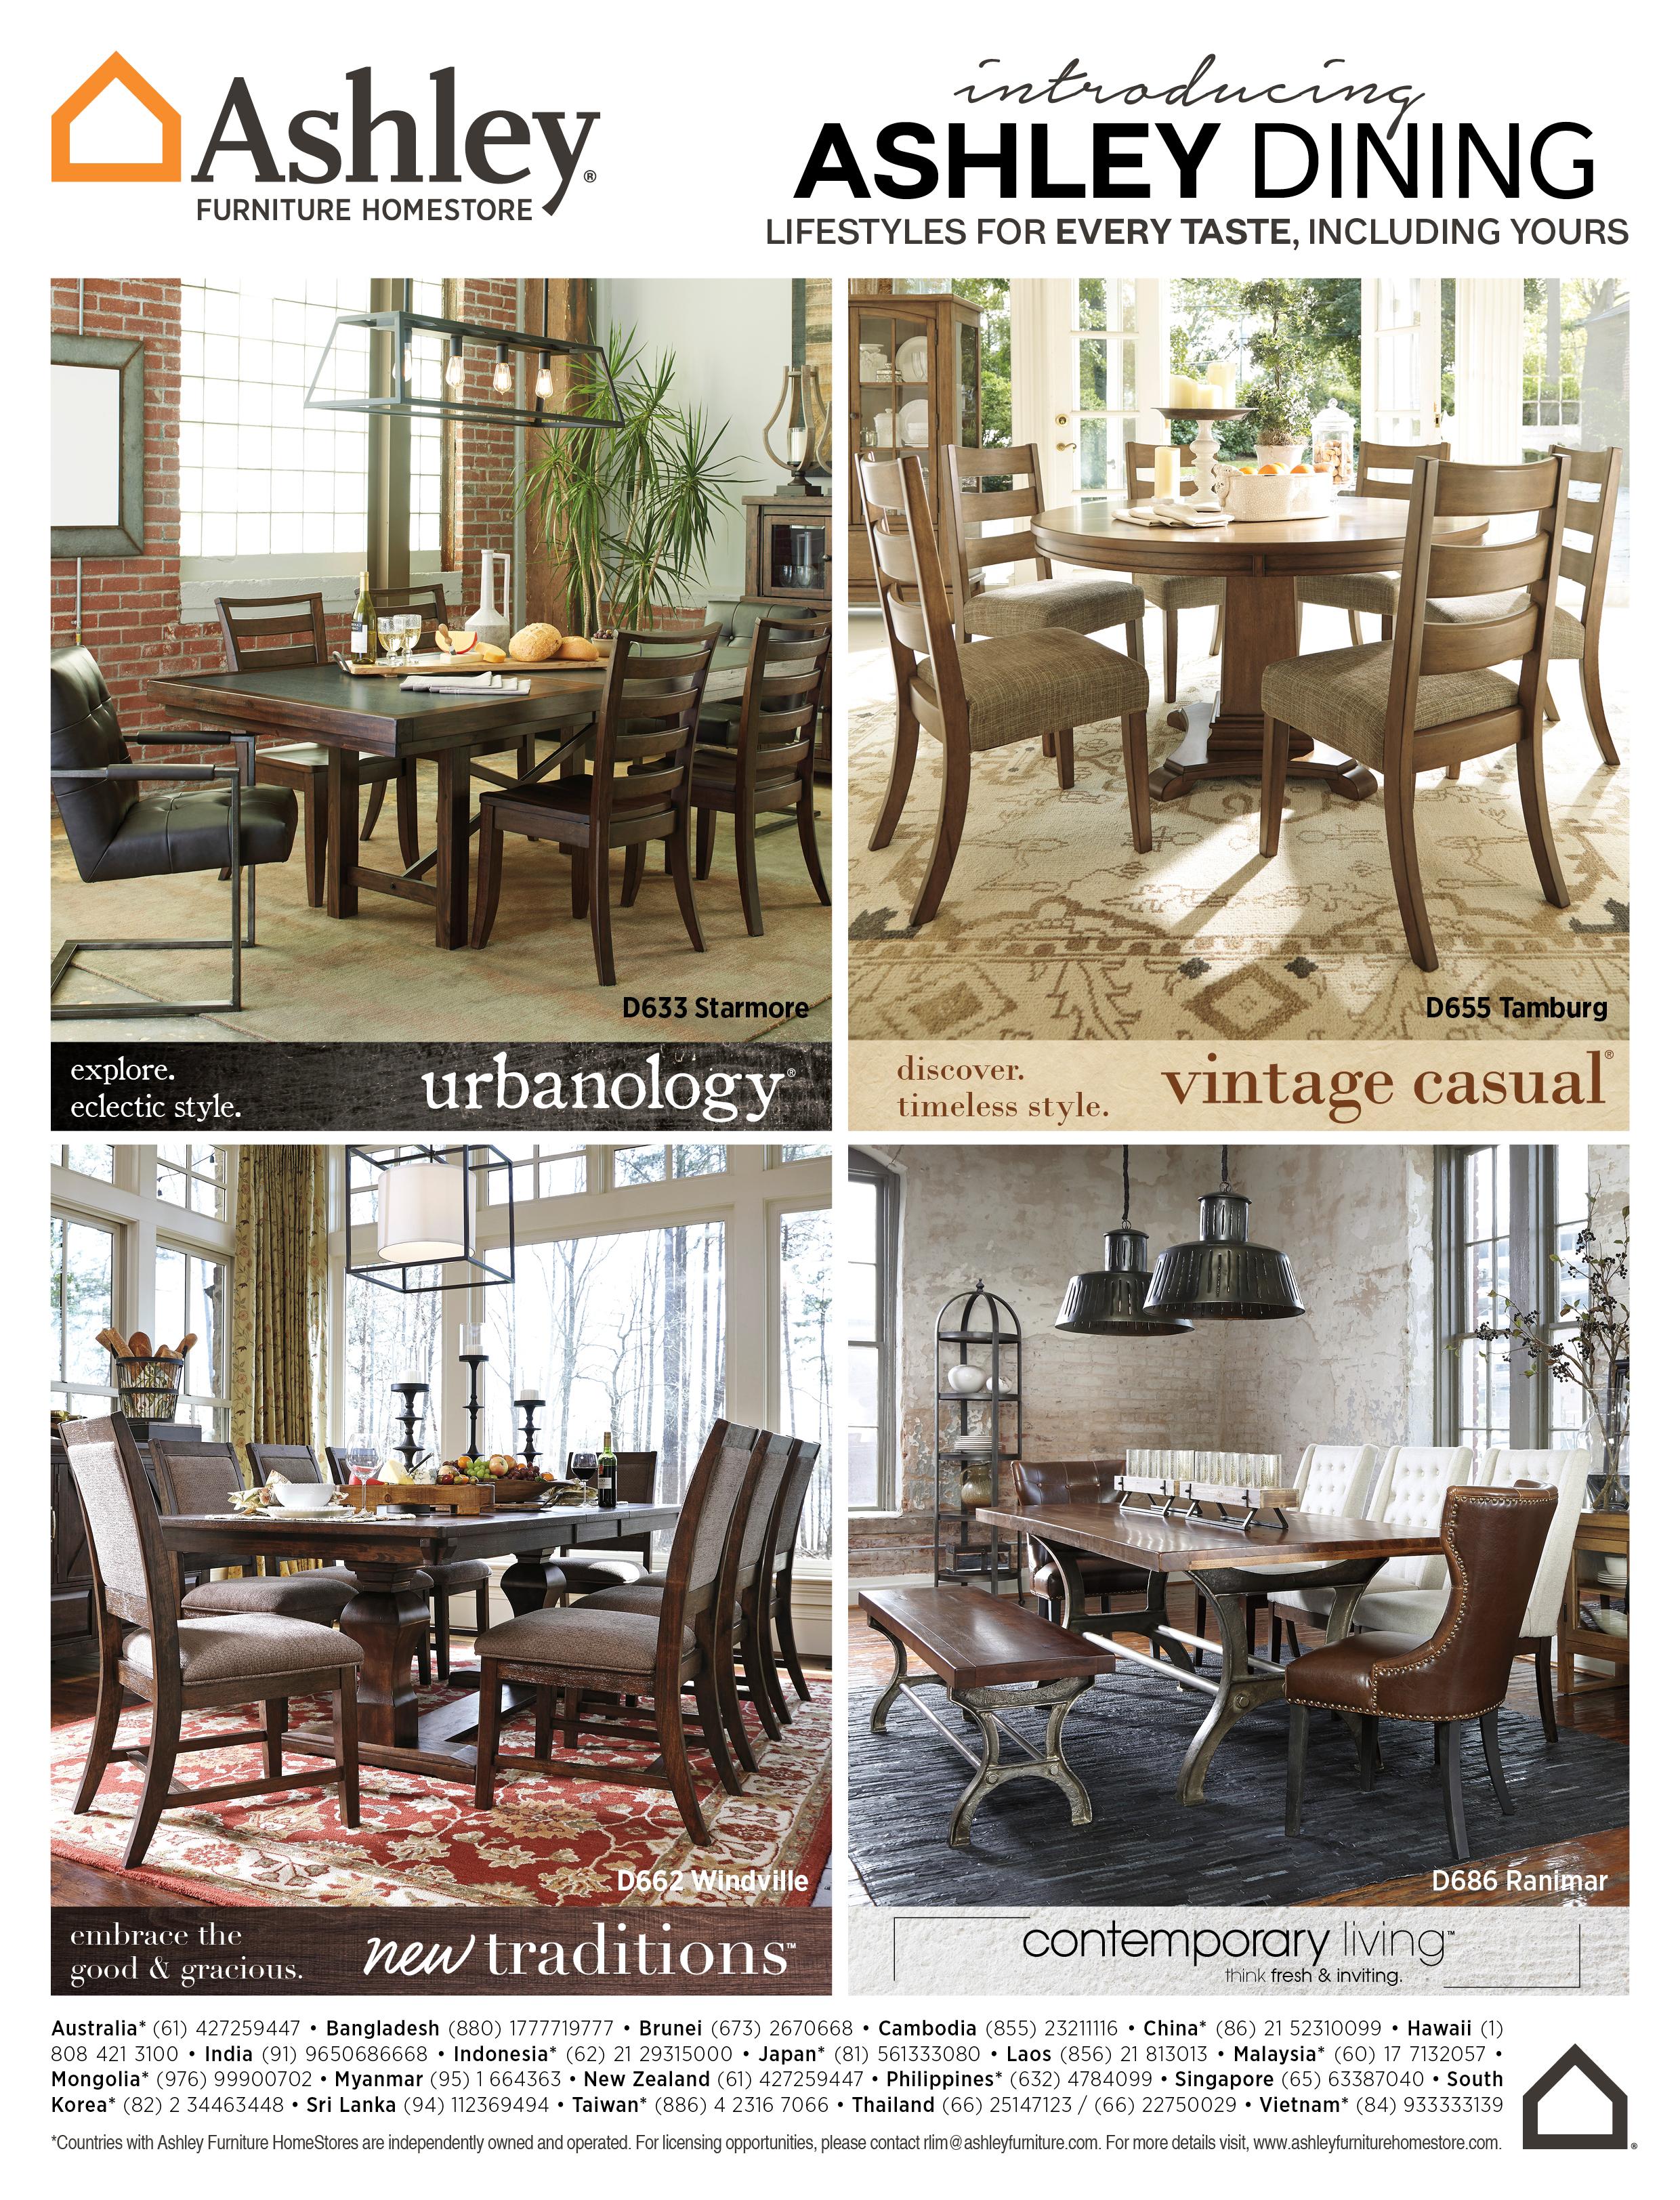 AirAsia Magazine Ad Ashley Furniture HomeStore Asia On Behance